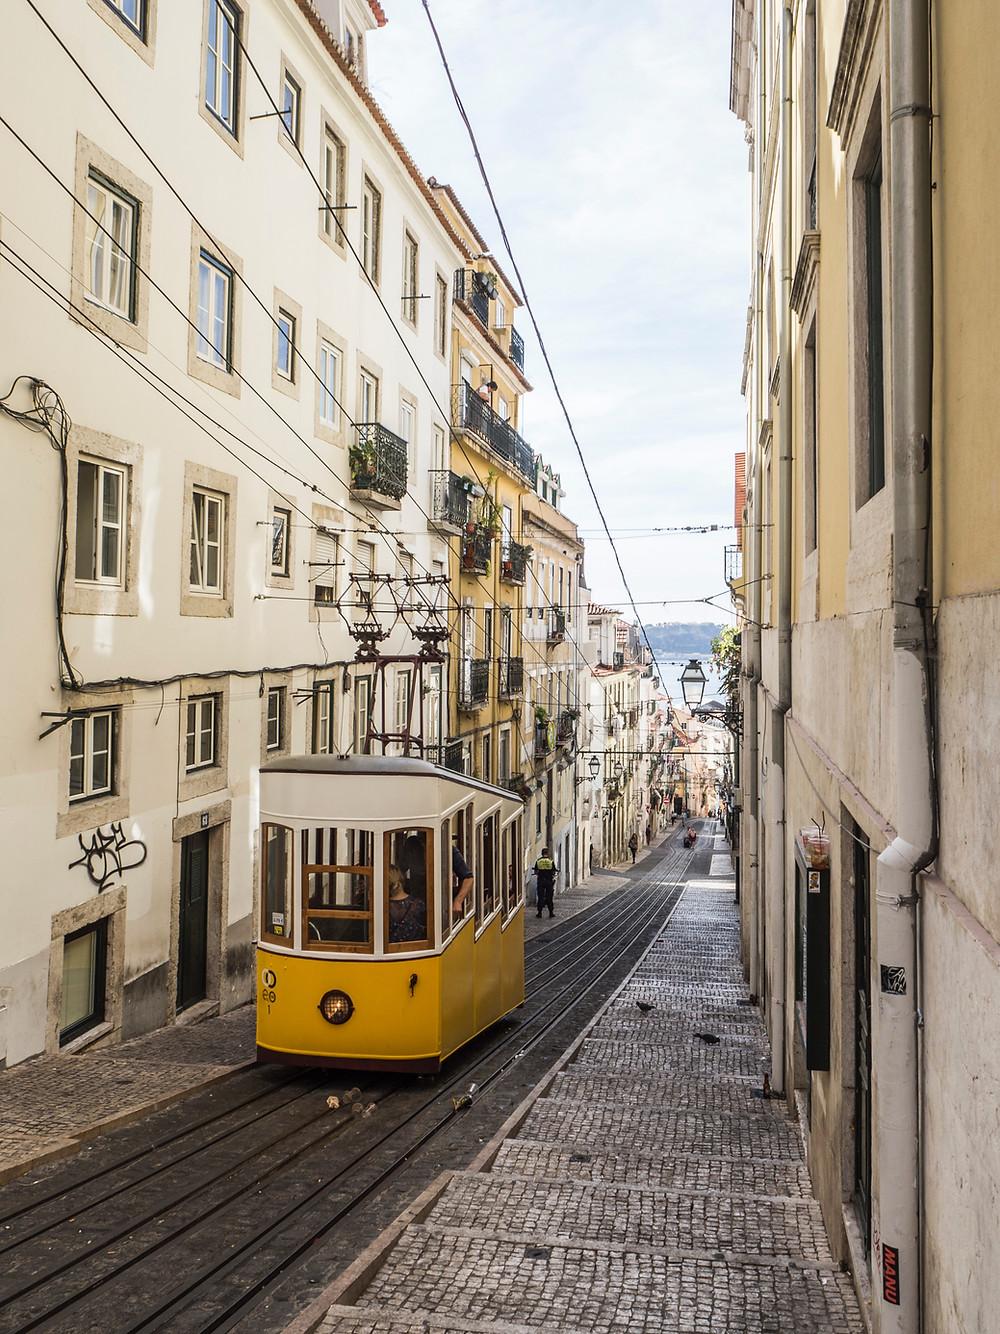 Желтый трамвай в Лиссабоне, Португалия